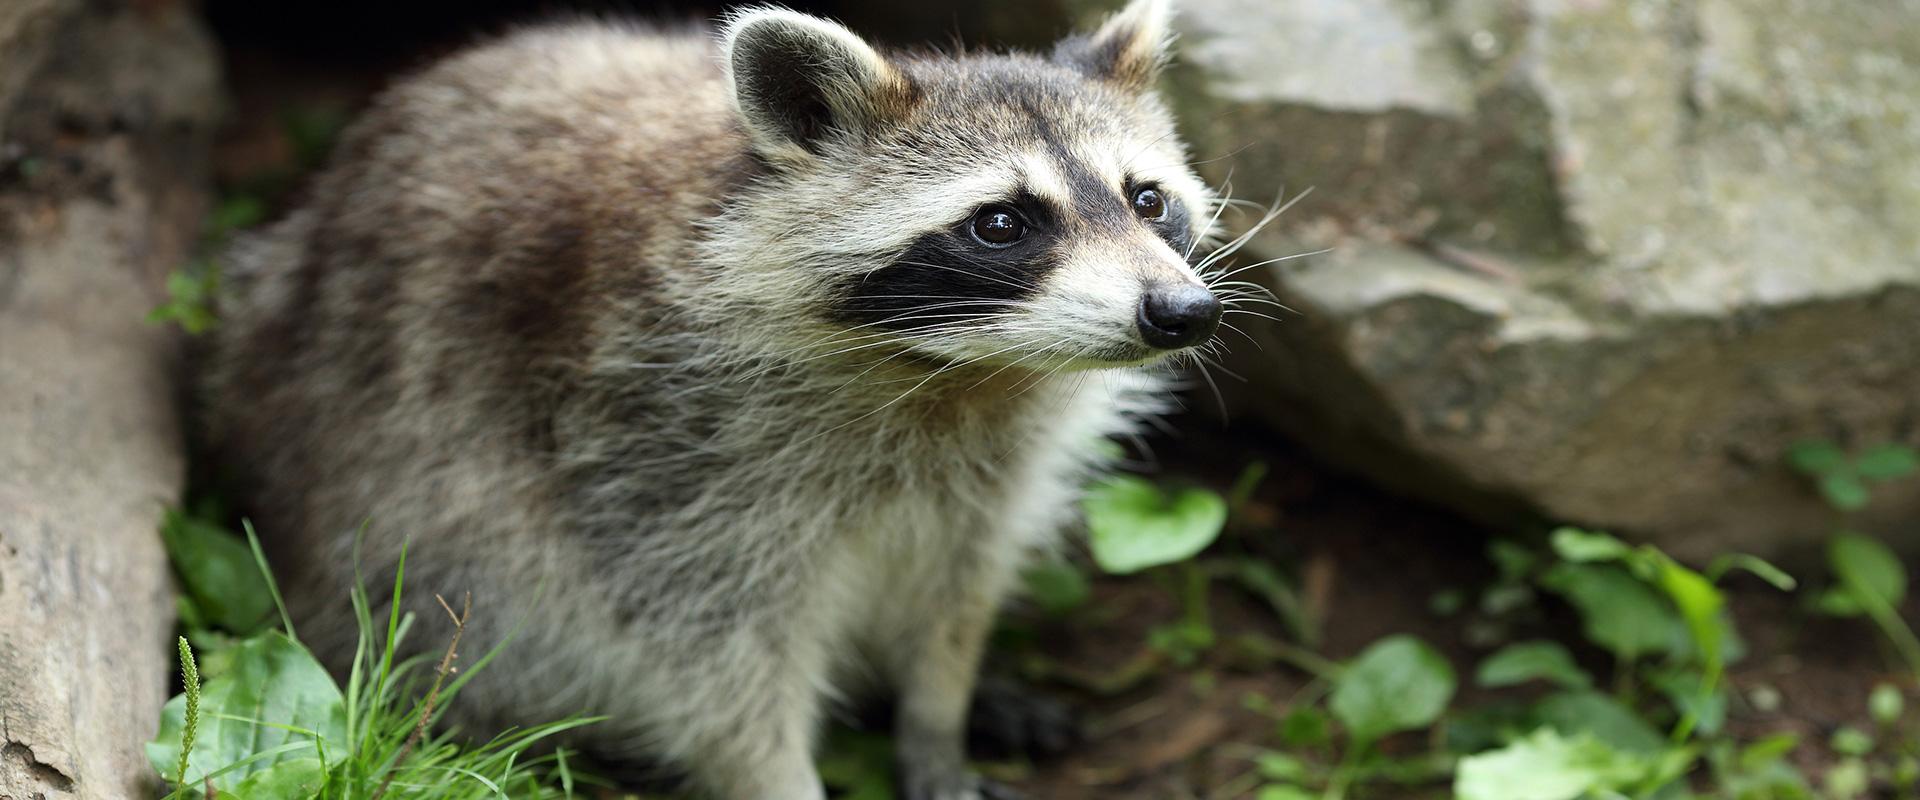 Pest Control Company, Exterminator, Wildlife Removal